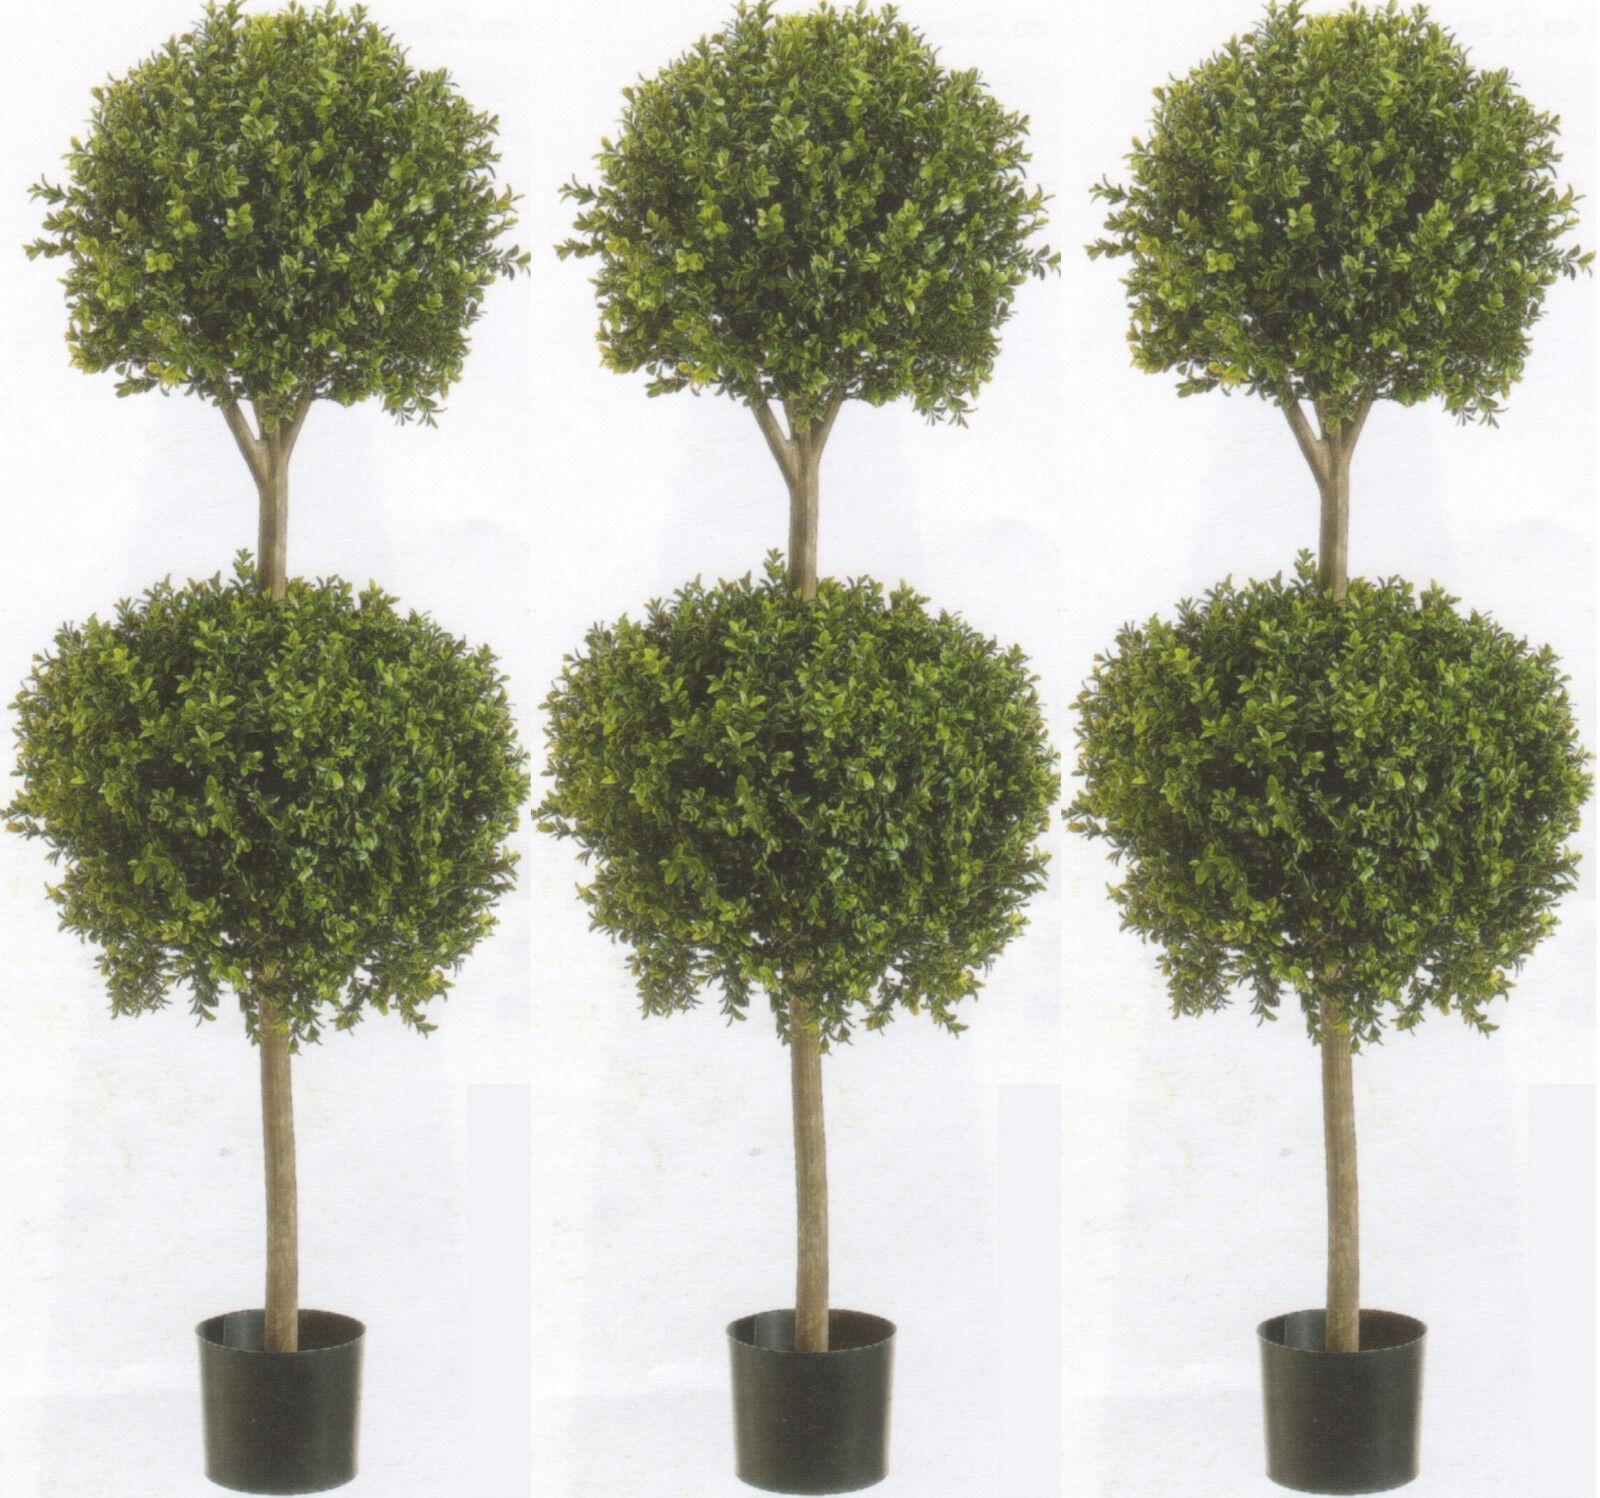 3 Artifiical 56  Boxwood 2 Ball Topiary Tree Plant Outdoor Bush Patio Pool 4' 8